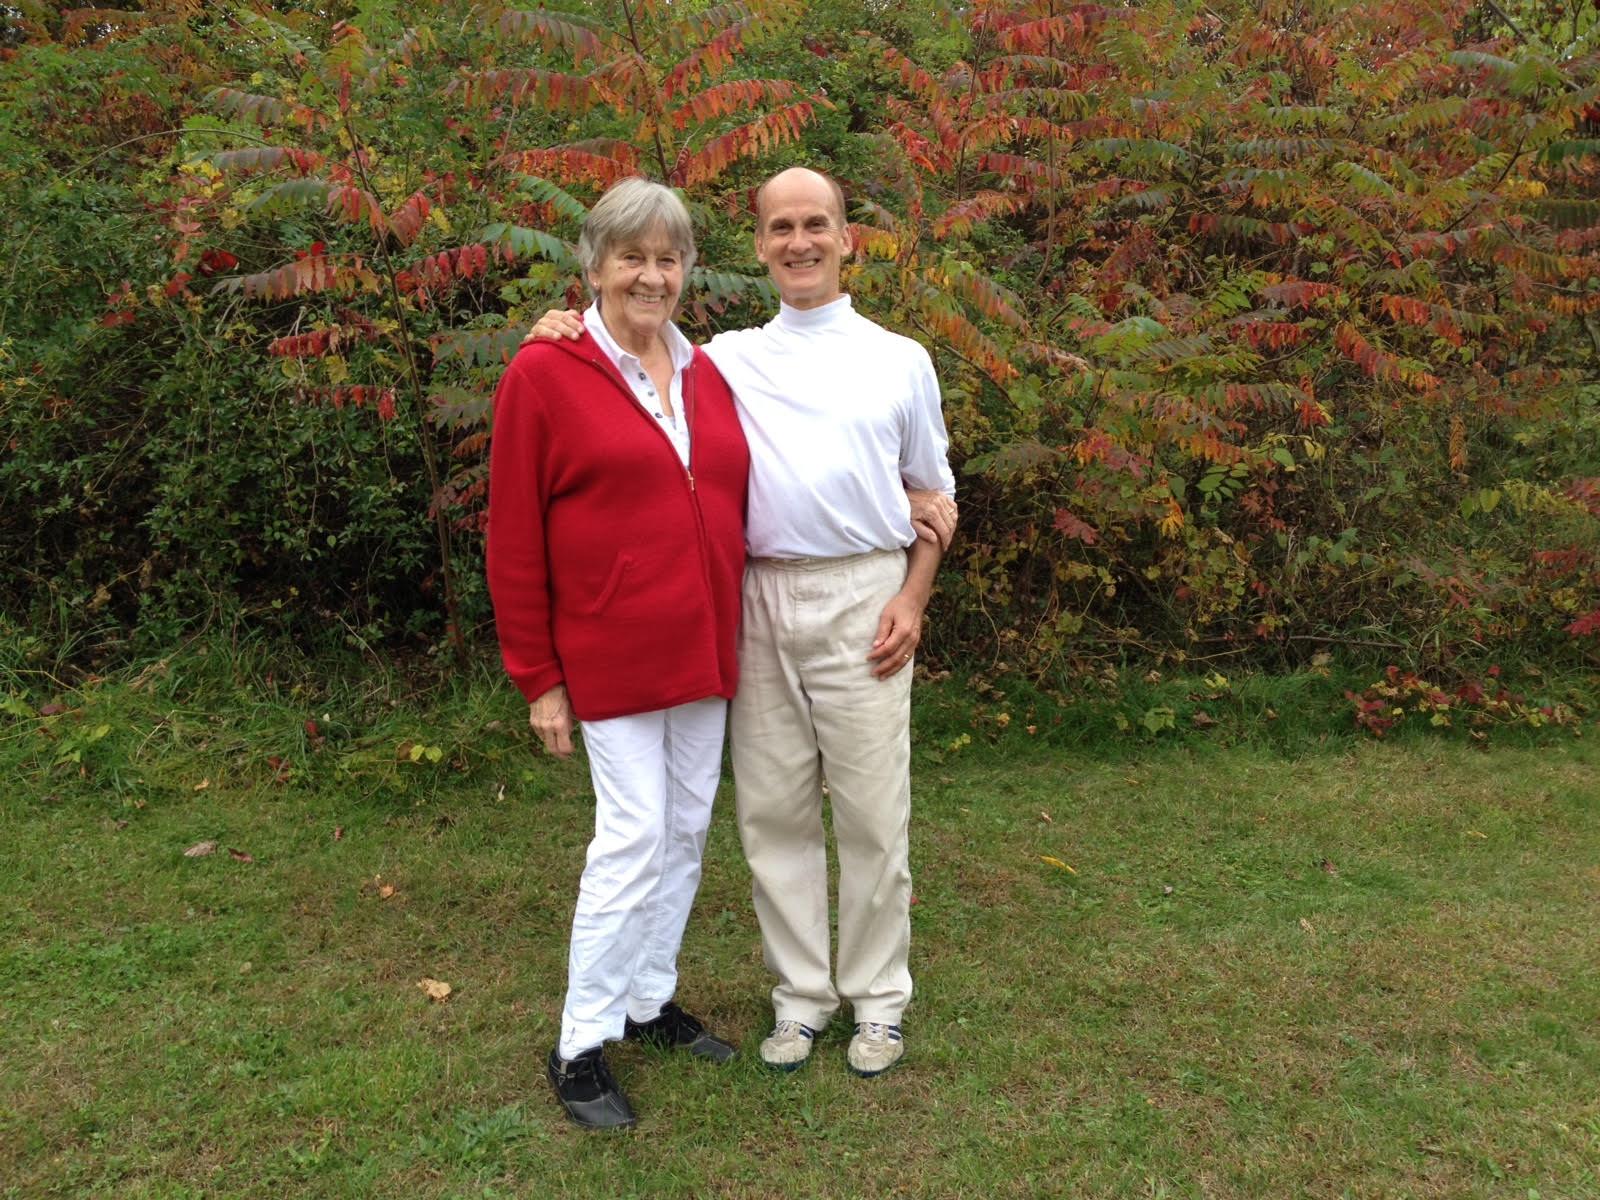 Alheidis Von Bothmer and Jaimen McMillan.  Mechanicville, NY, October 2013.